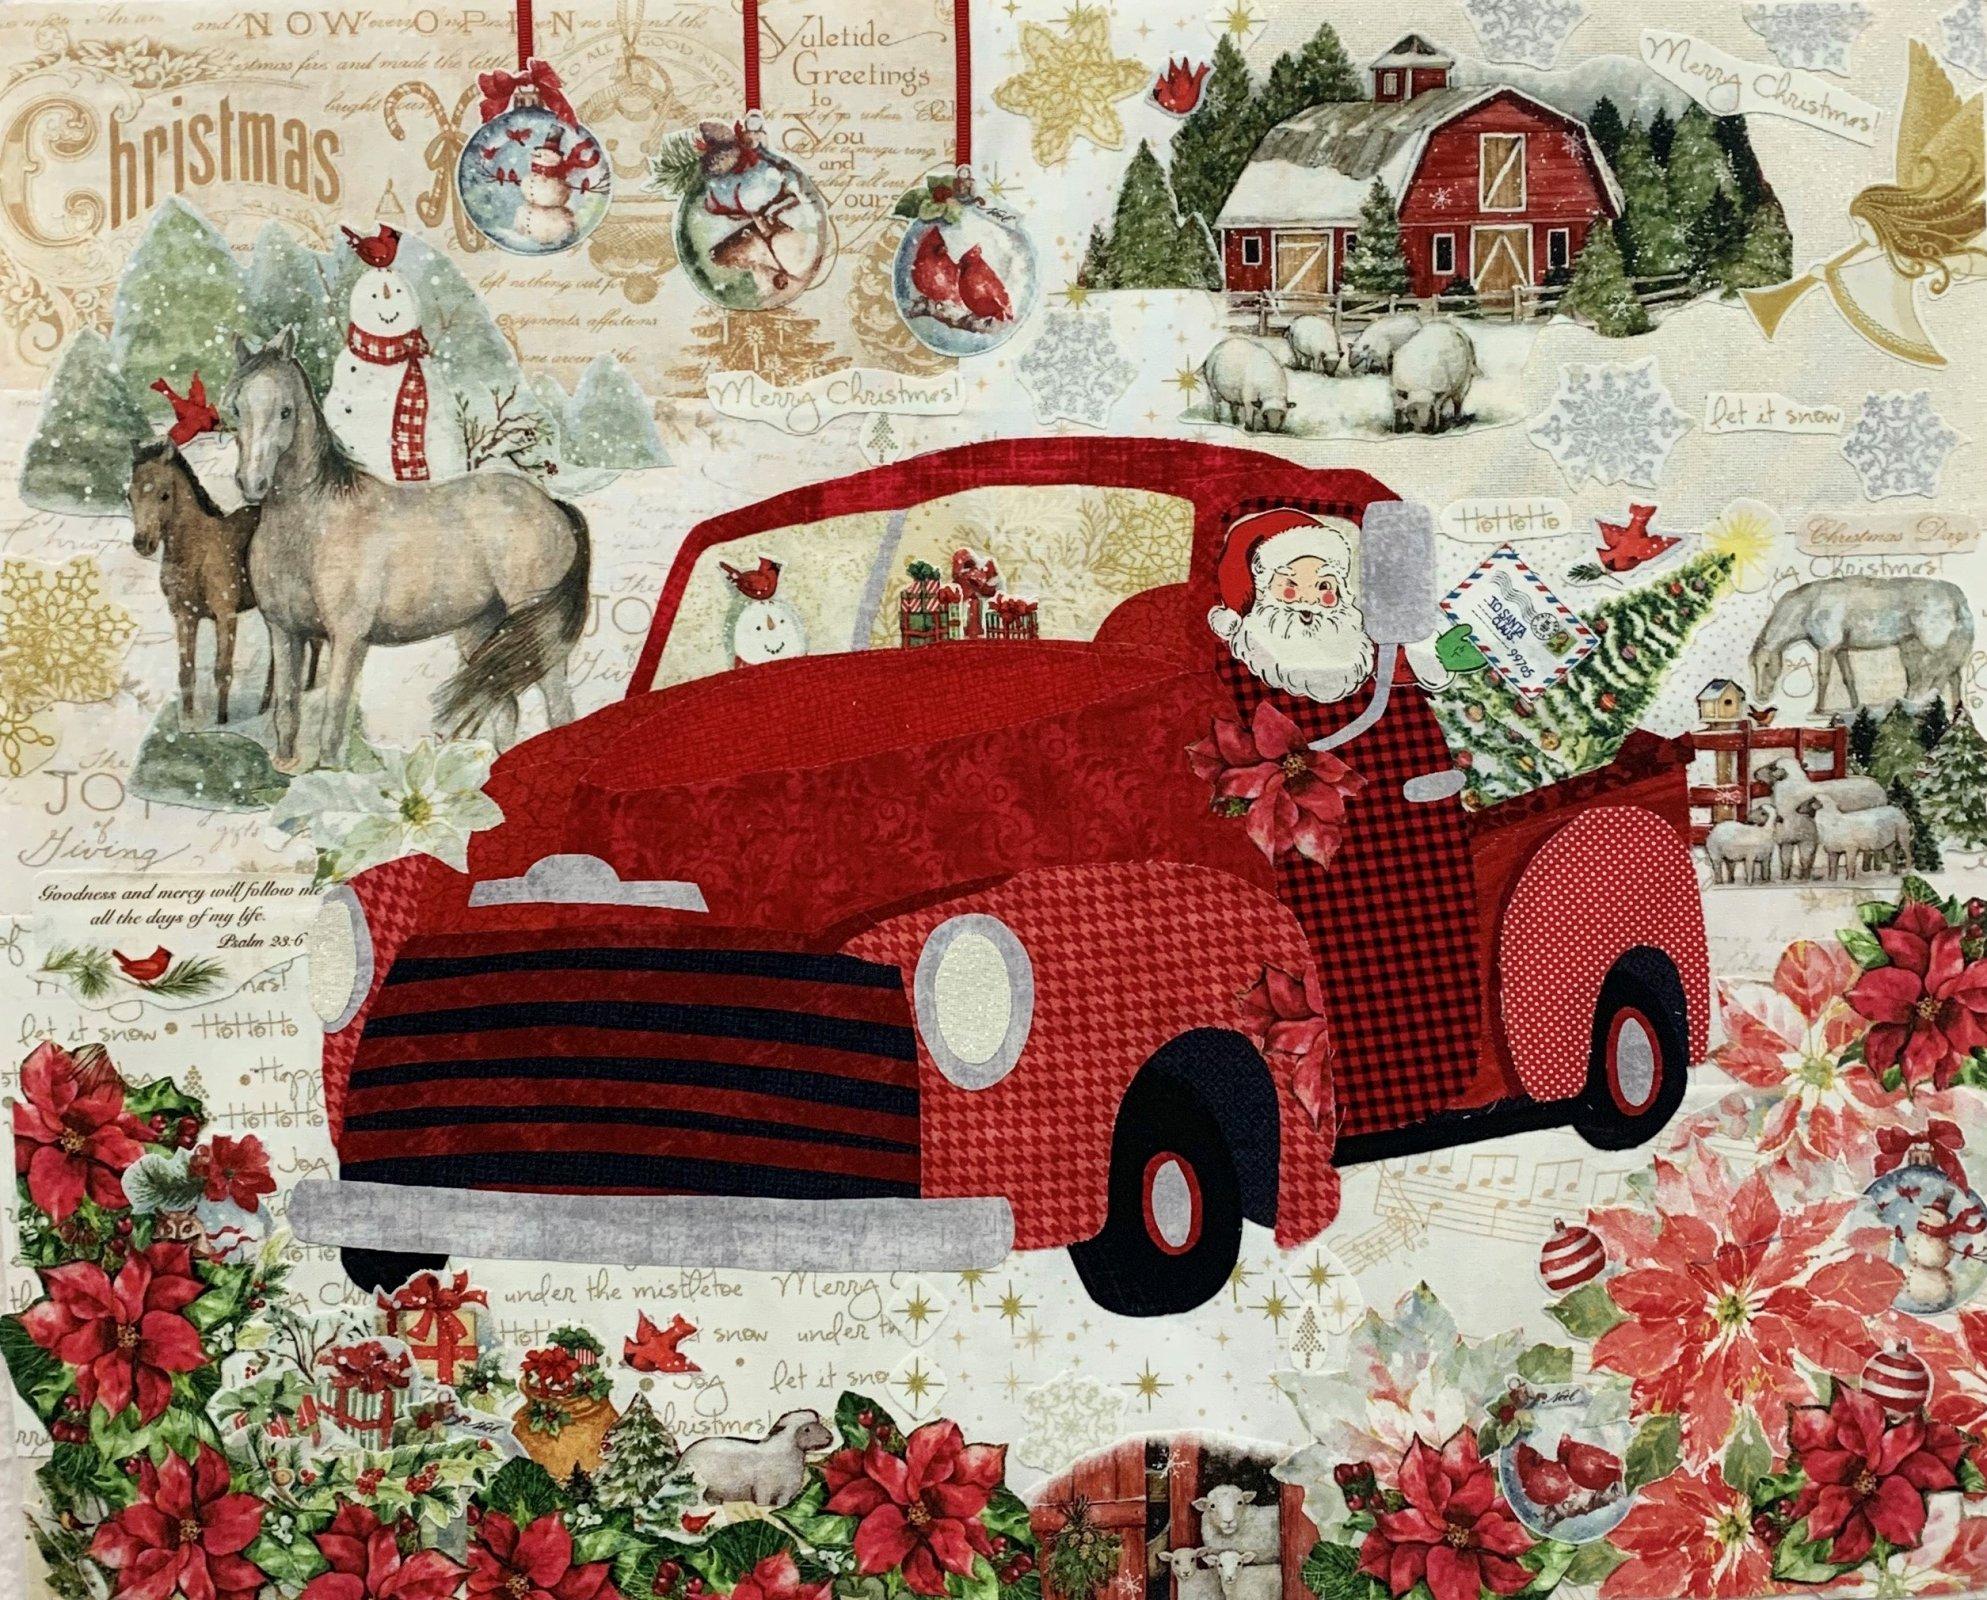 Teeny Tiny Christmas Truck Collage Fabric Kit